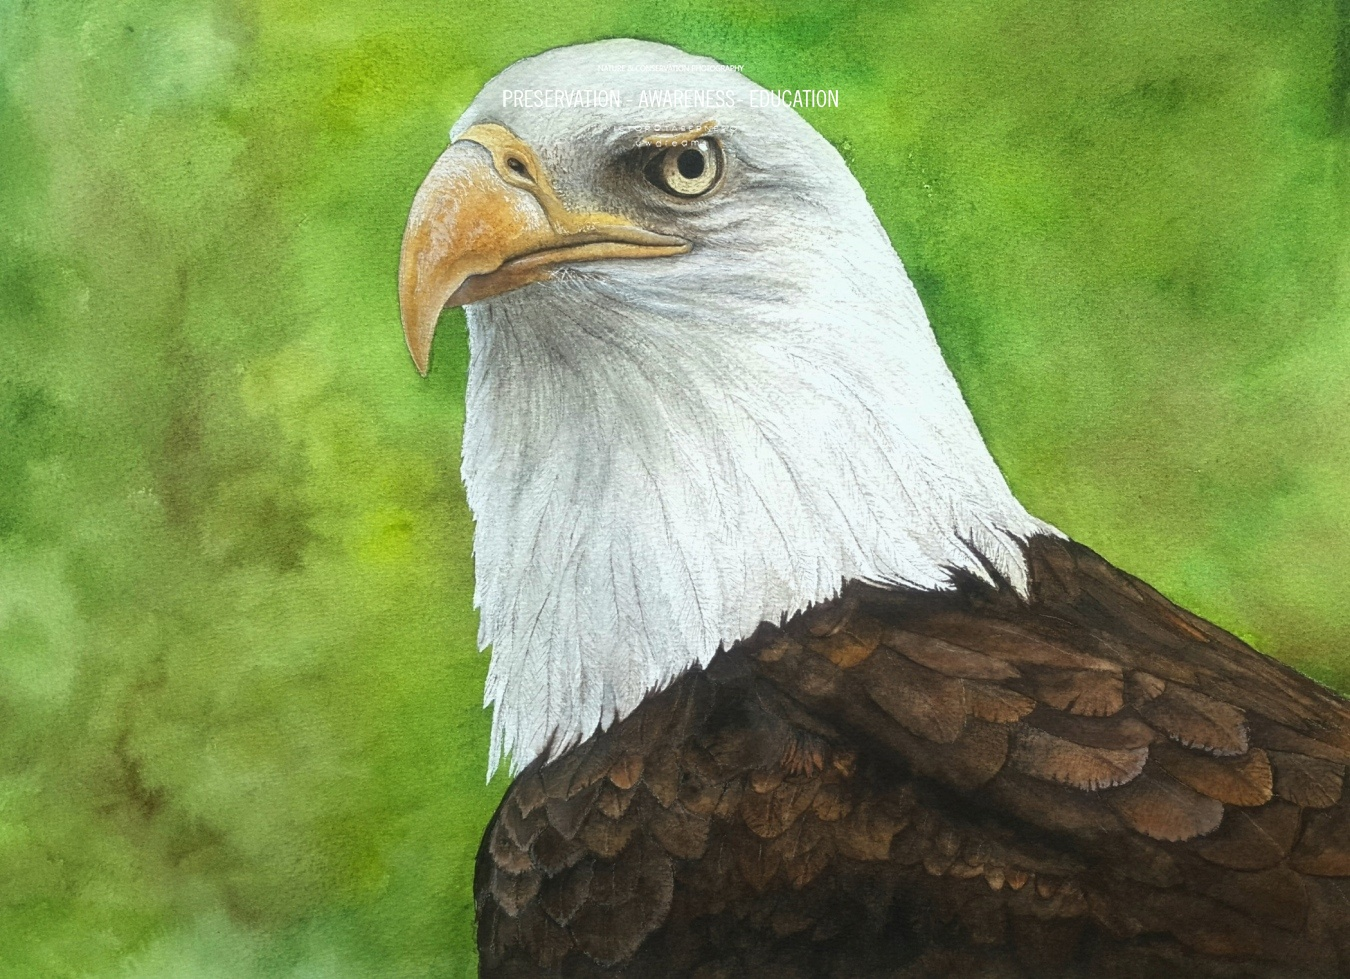 Aguila Calva - 41x31cm - Vida Salvaje - Wildlife Conservation Photography, UWDREAMS.COM